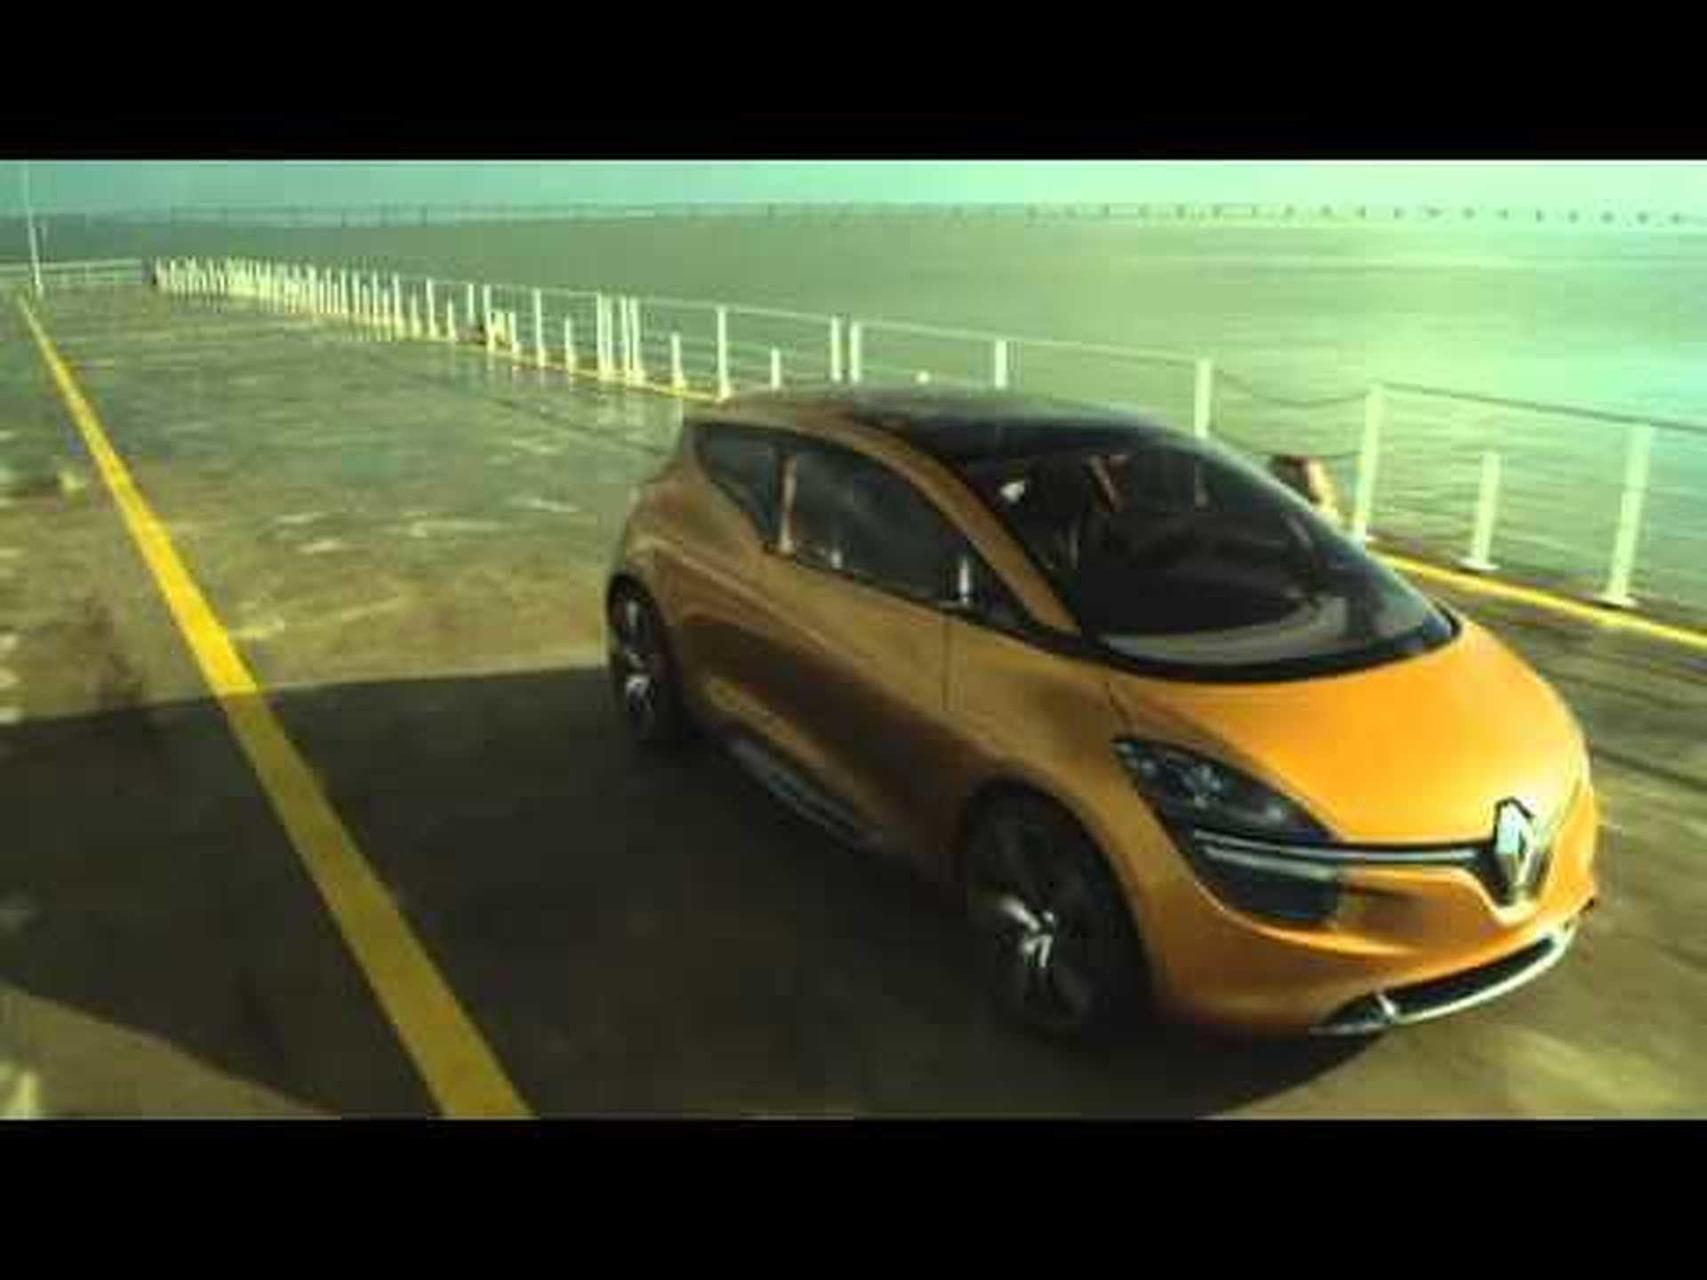 2011 Renault R-Space Concept Dynamic Shots